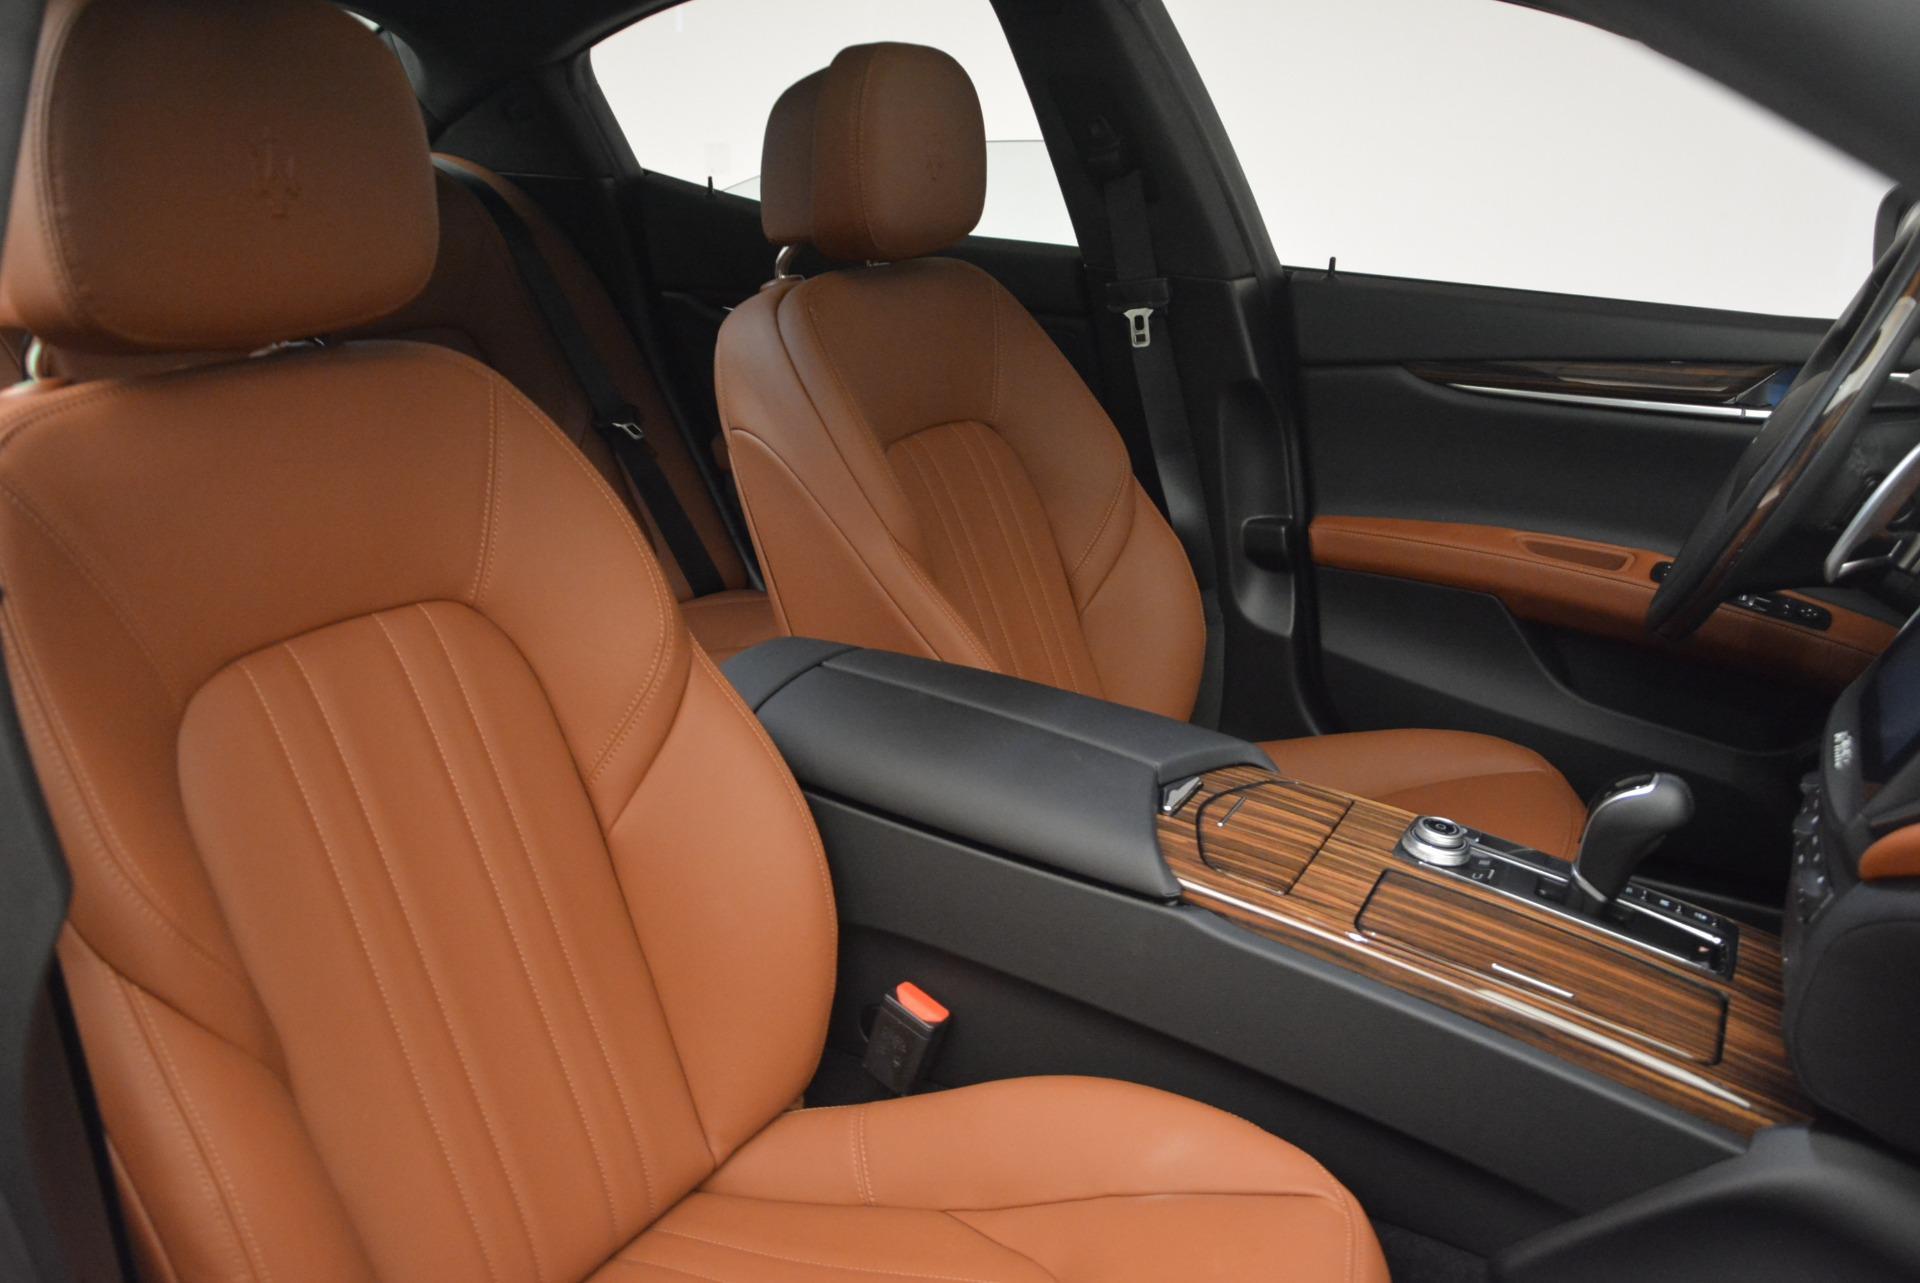 Used 2018 Maserati Ghibli S Q4 For Sale In Westport, CT 1566_p15